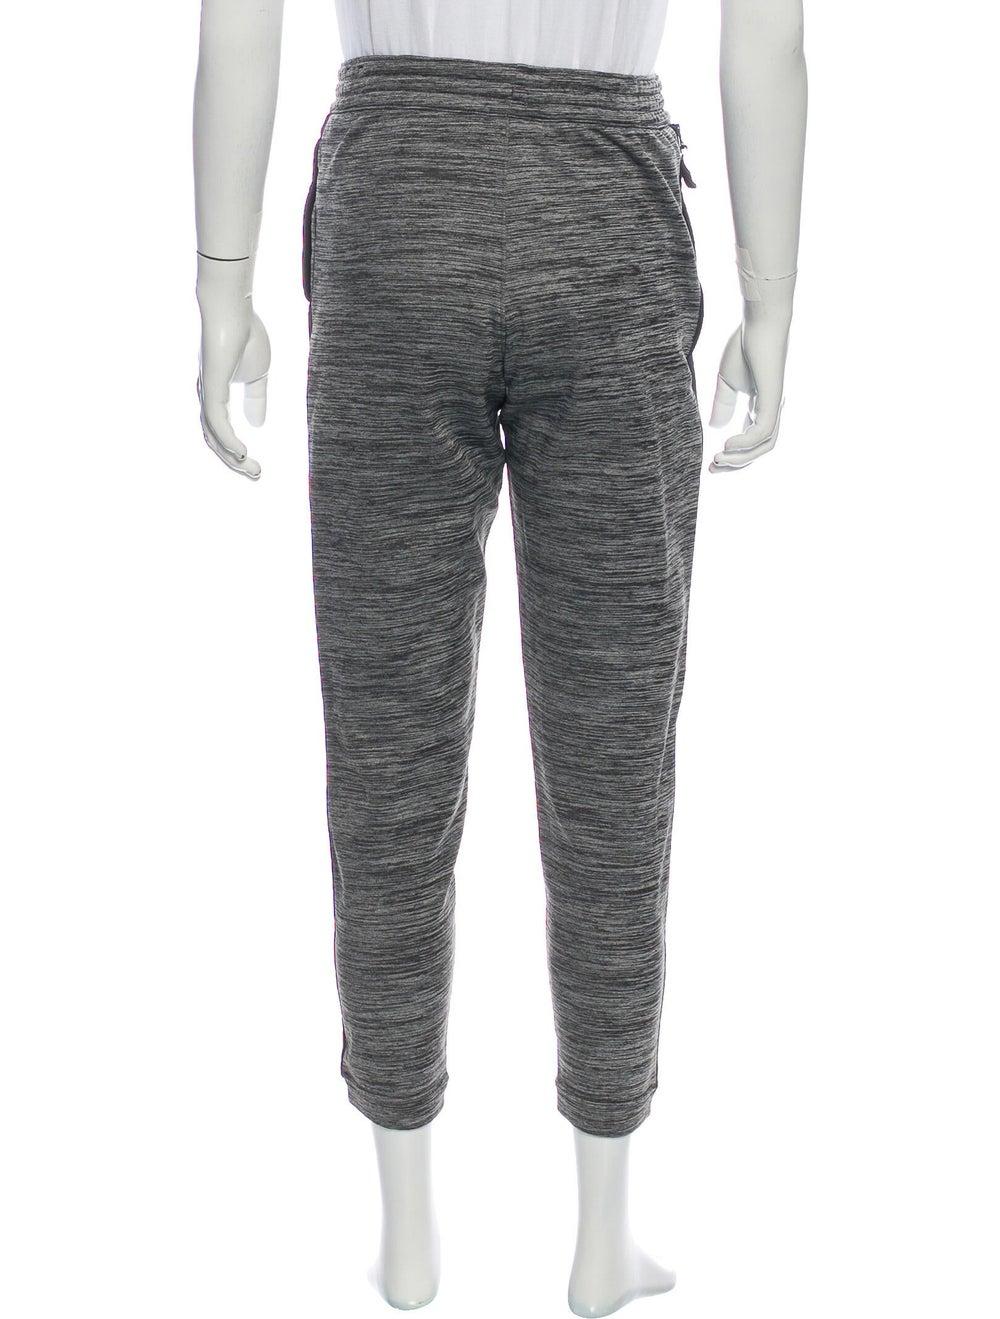 Nike Sweatpants Grey - image 3